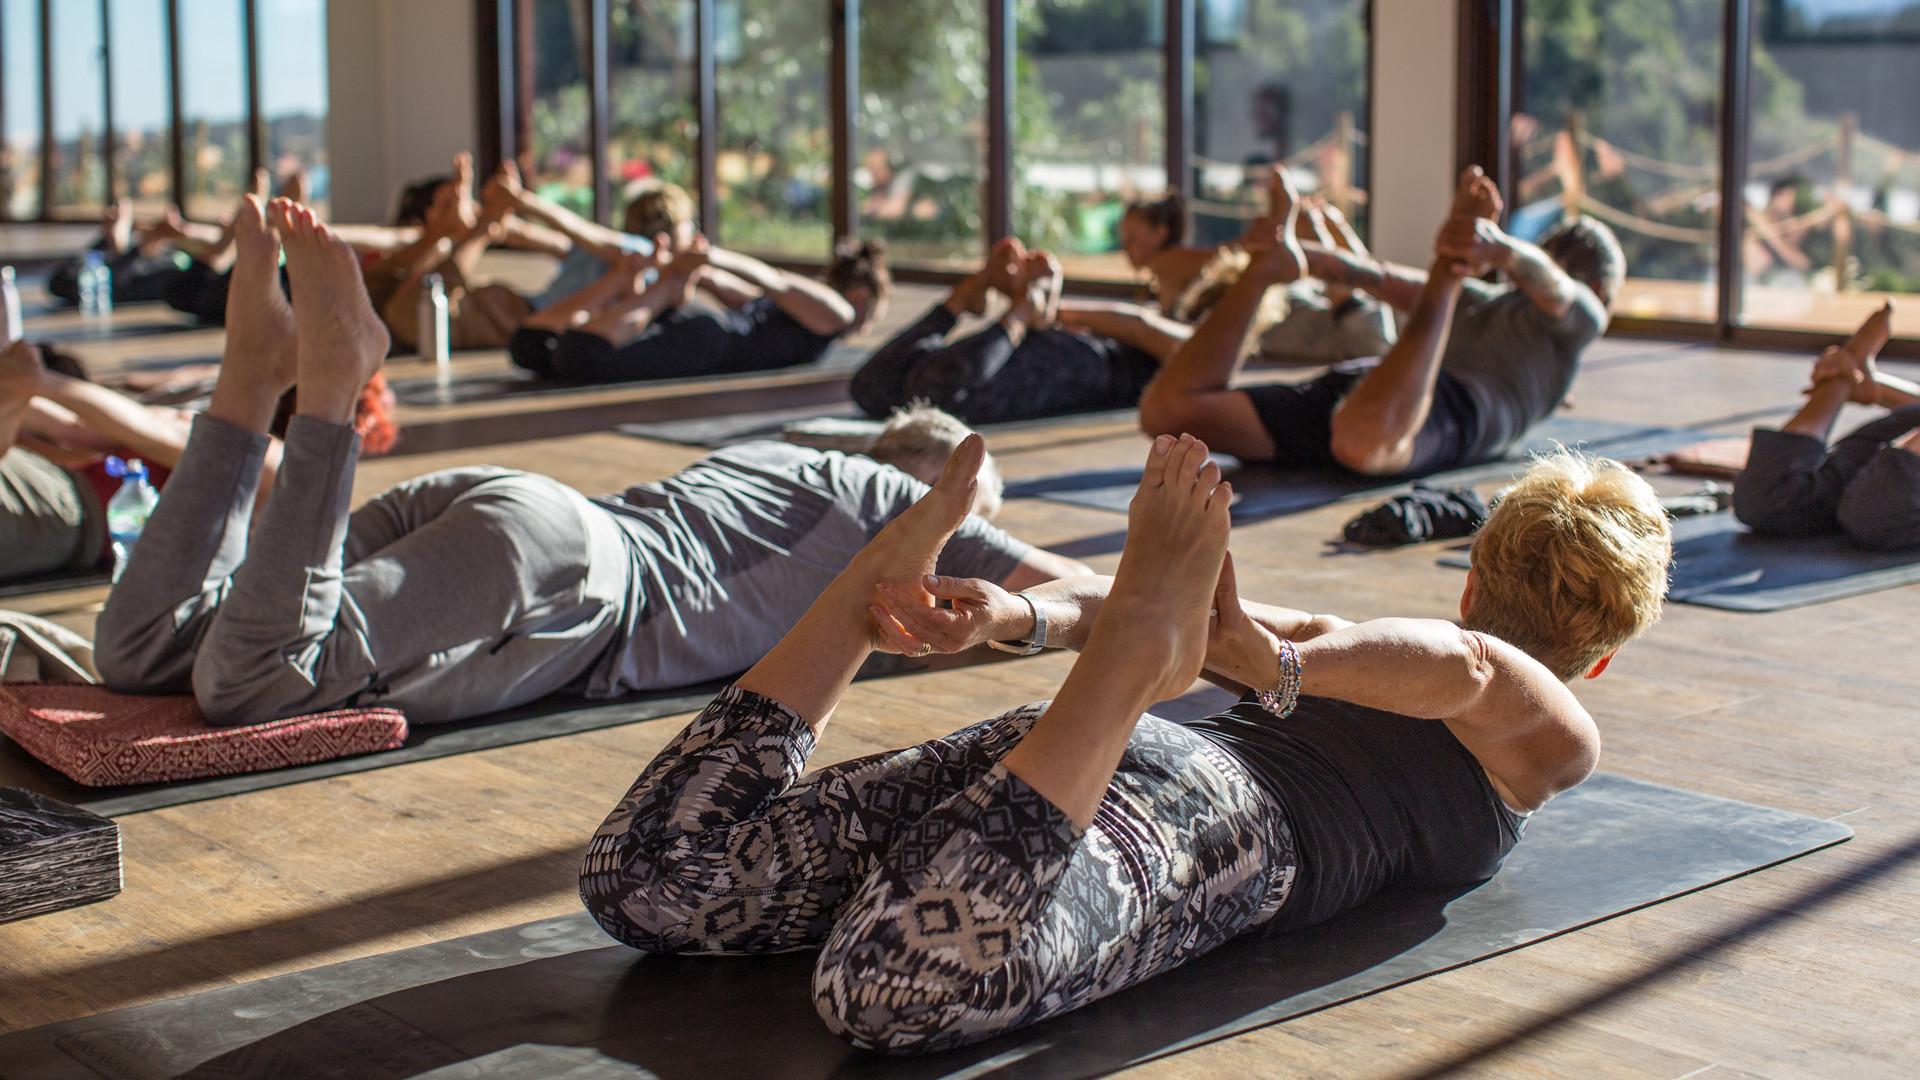 WildViewRetreat_Yoga_Class_25.JPG